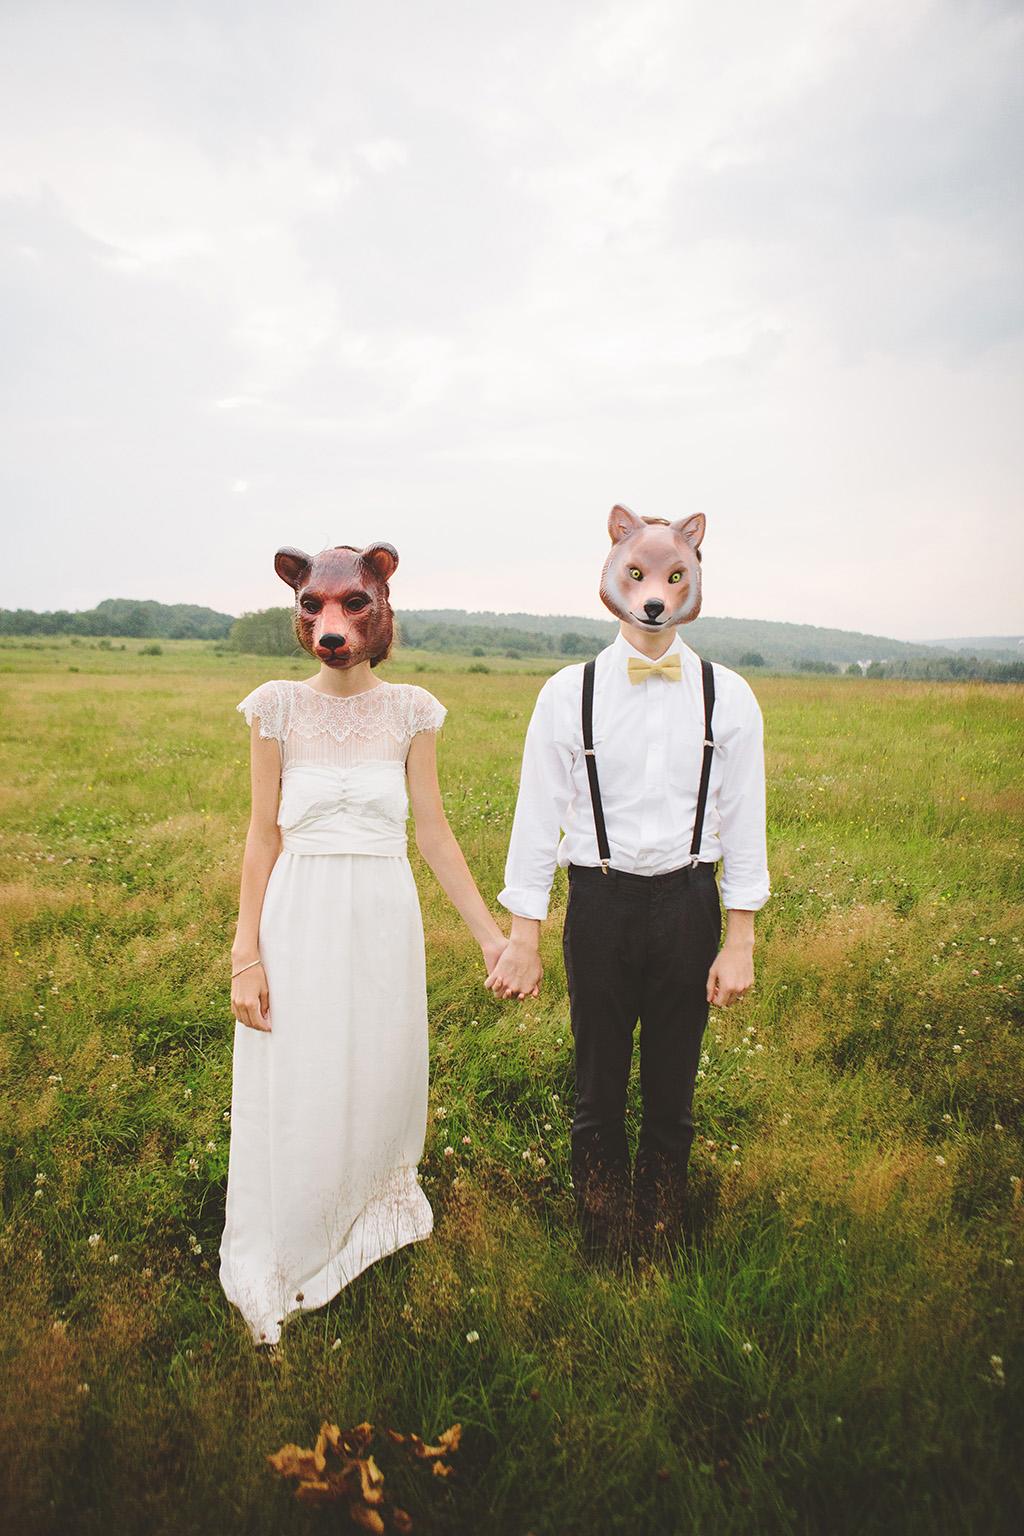 Animal mask bridal portrait photobooth costume at DIY wedding